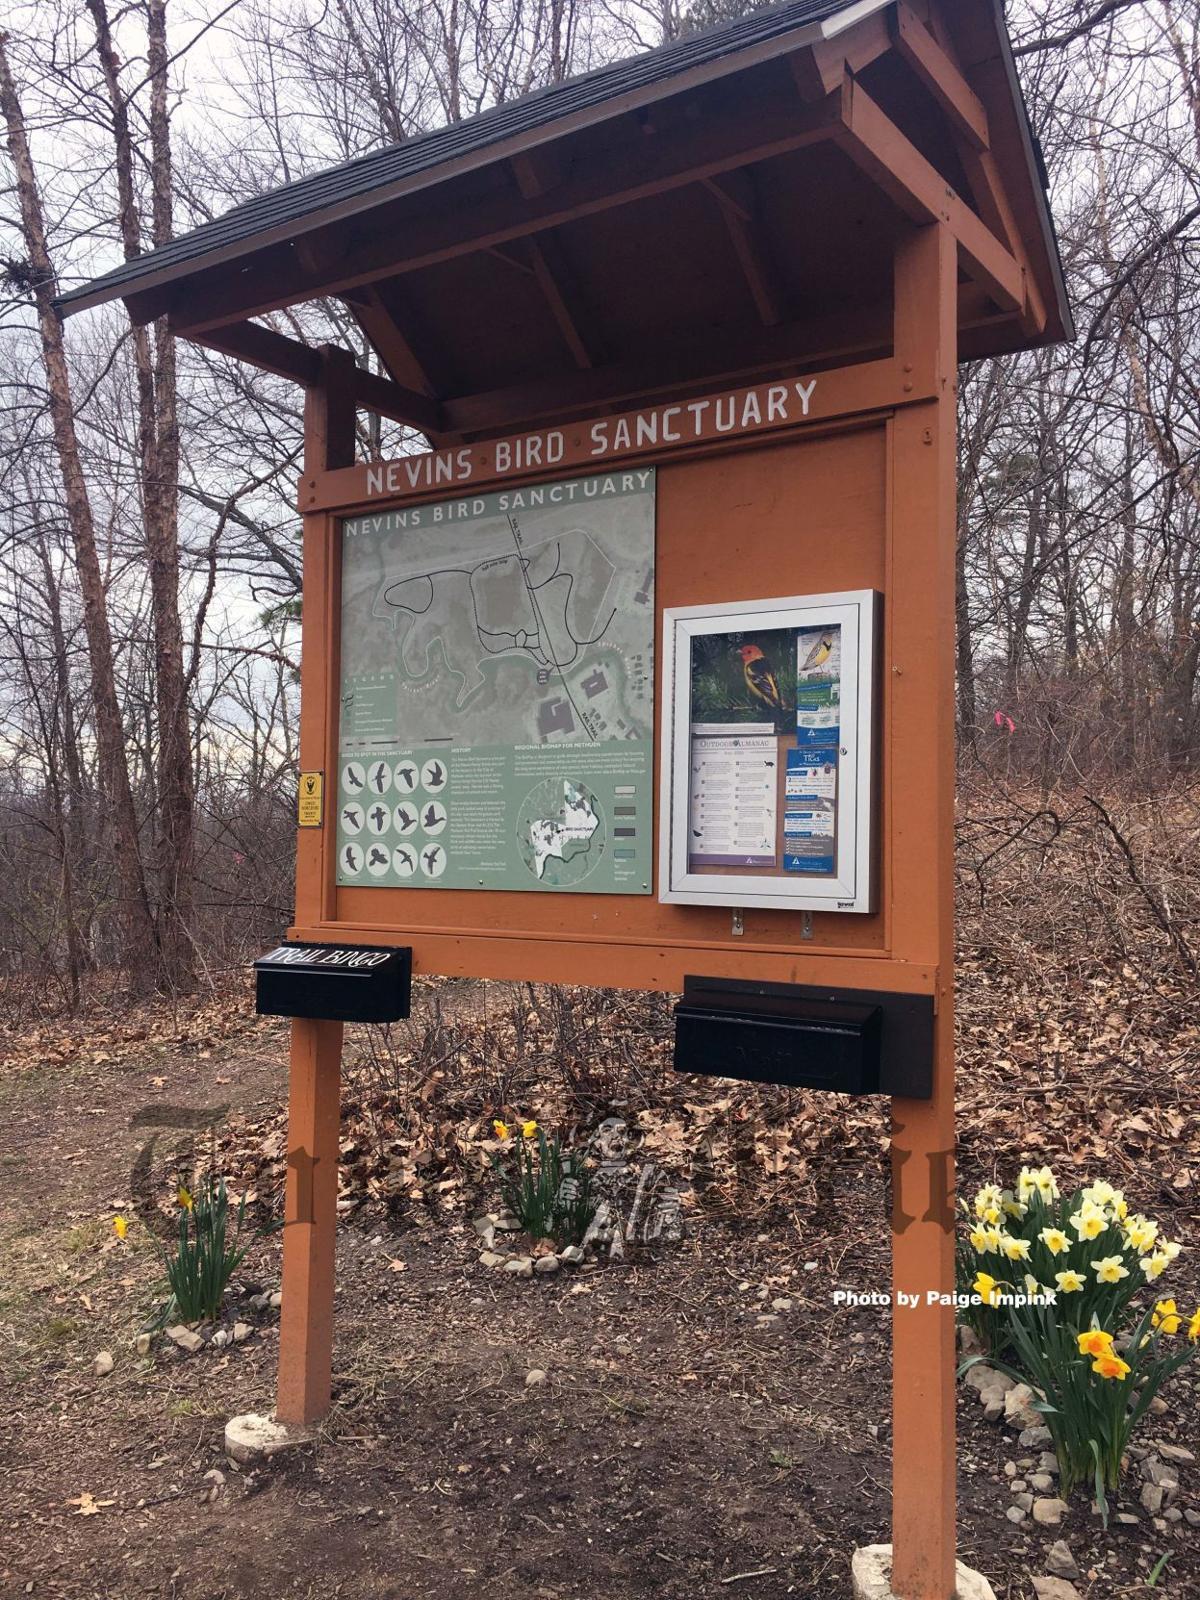 Nevins Bird Sanctuary